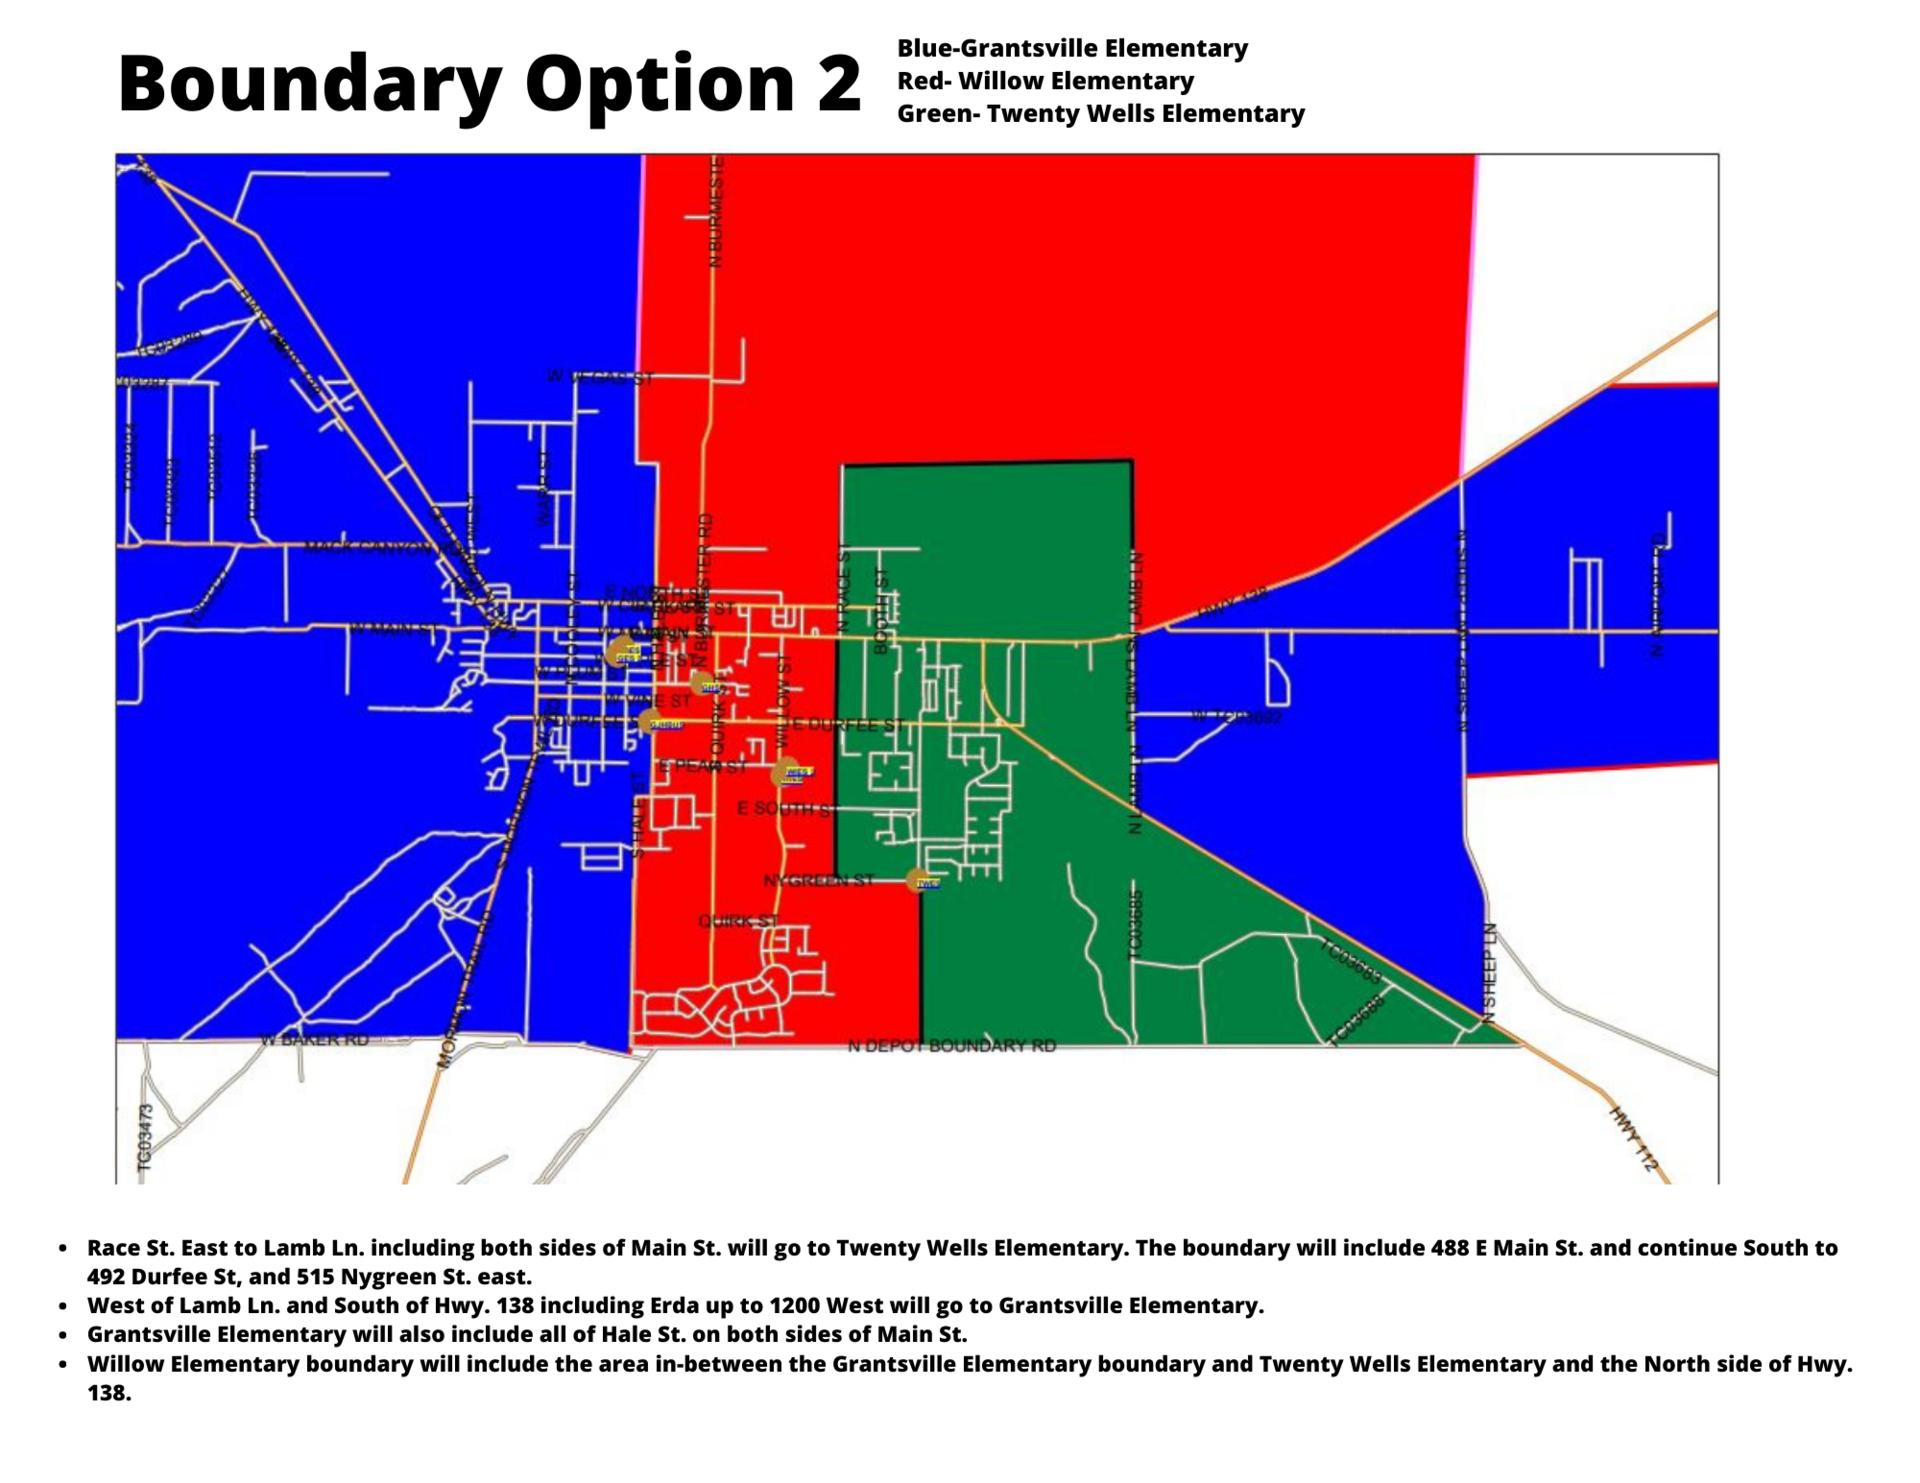 Map of boundary option 2